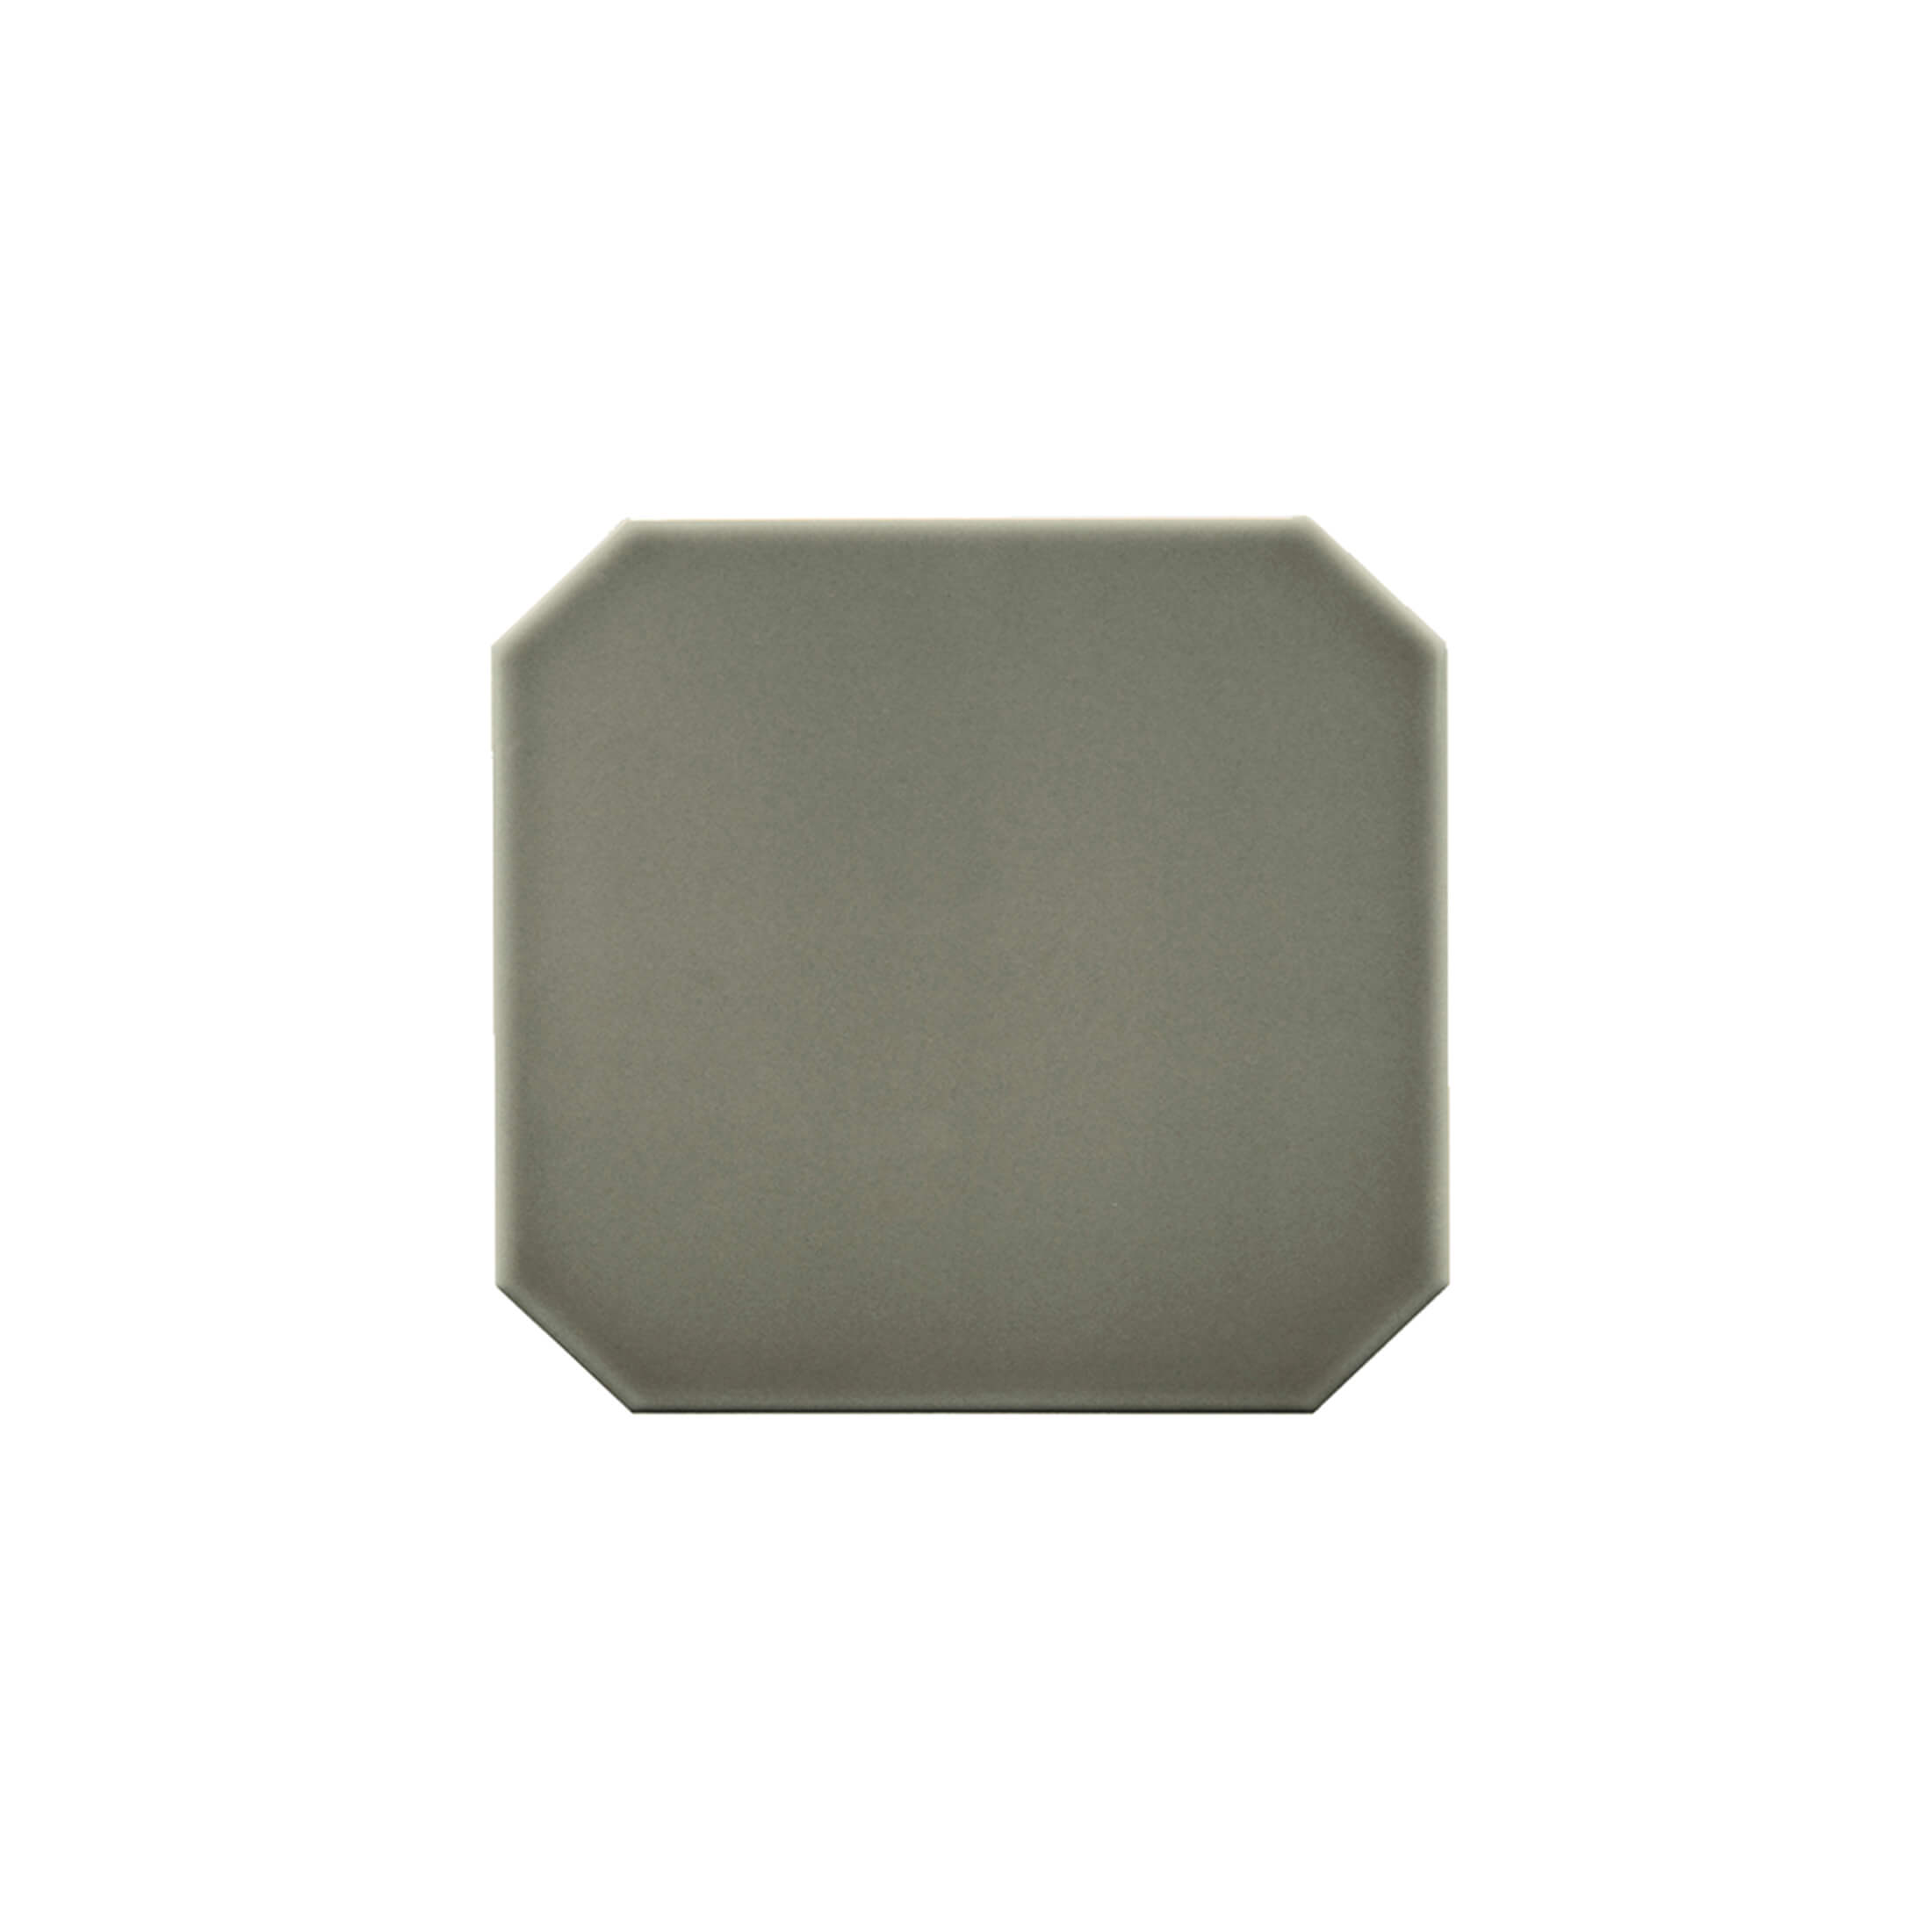 ADPV9010 - PAVIMENTO EUCALYPTUS - 15 cm X 15 cm